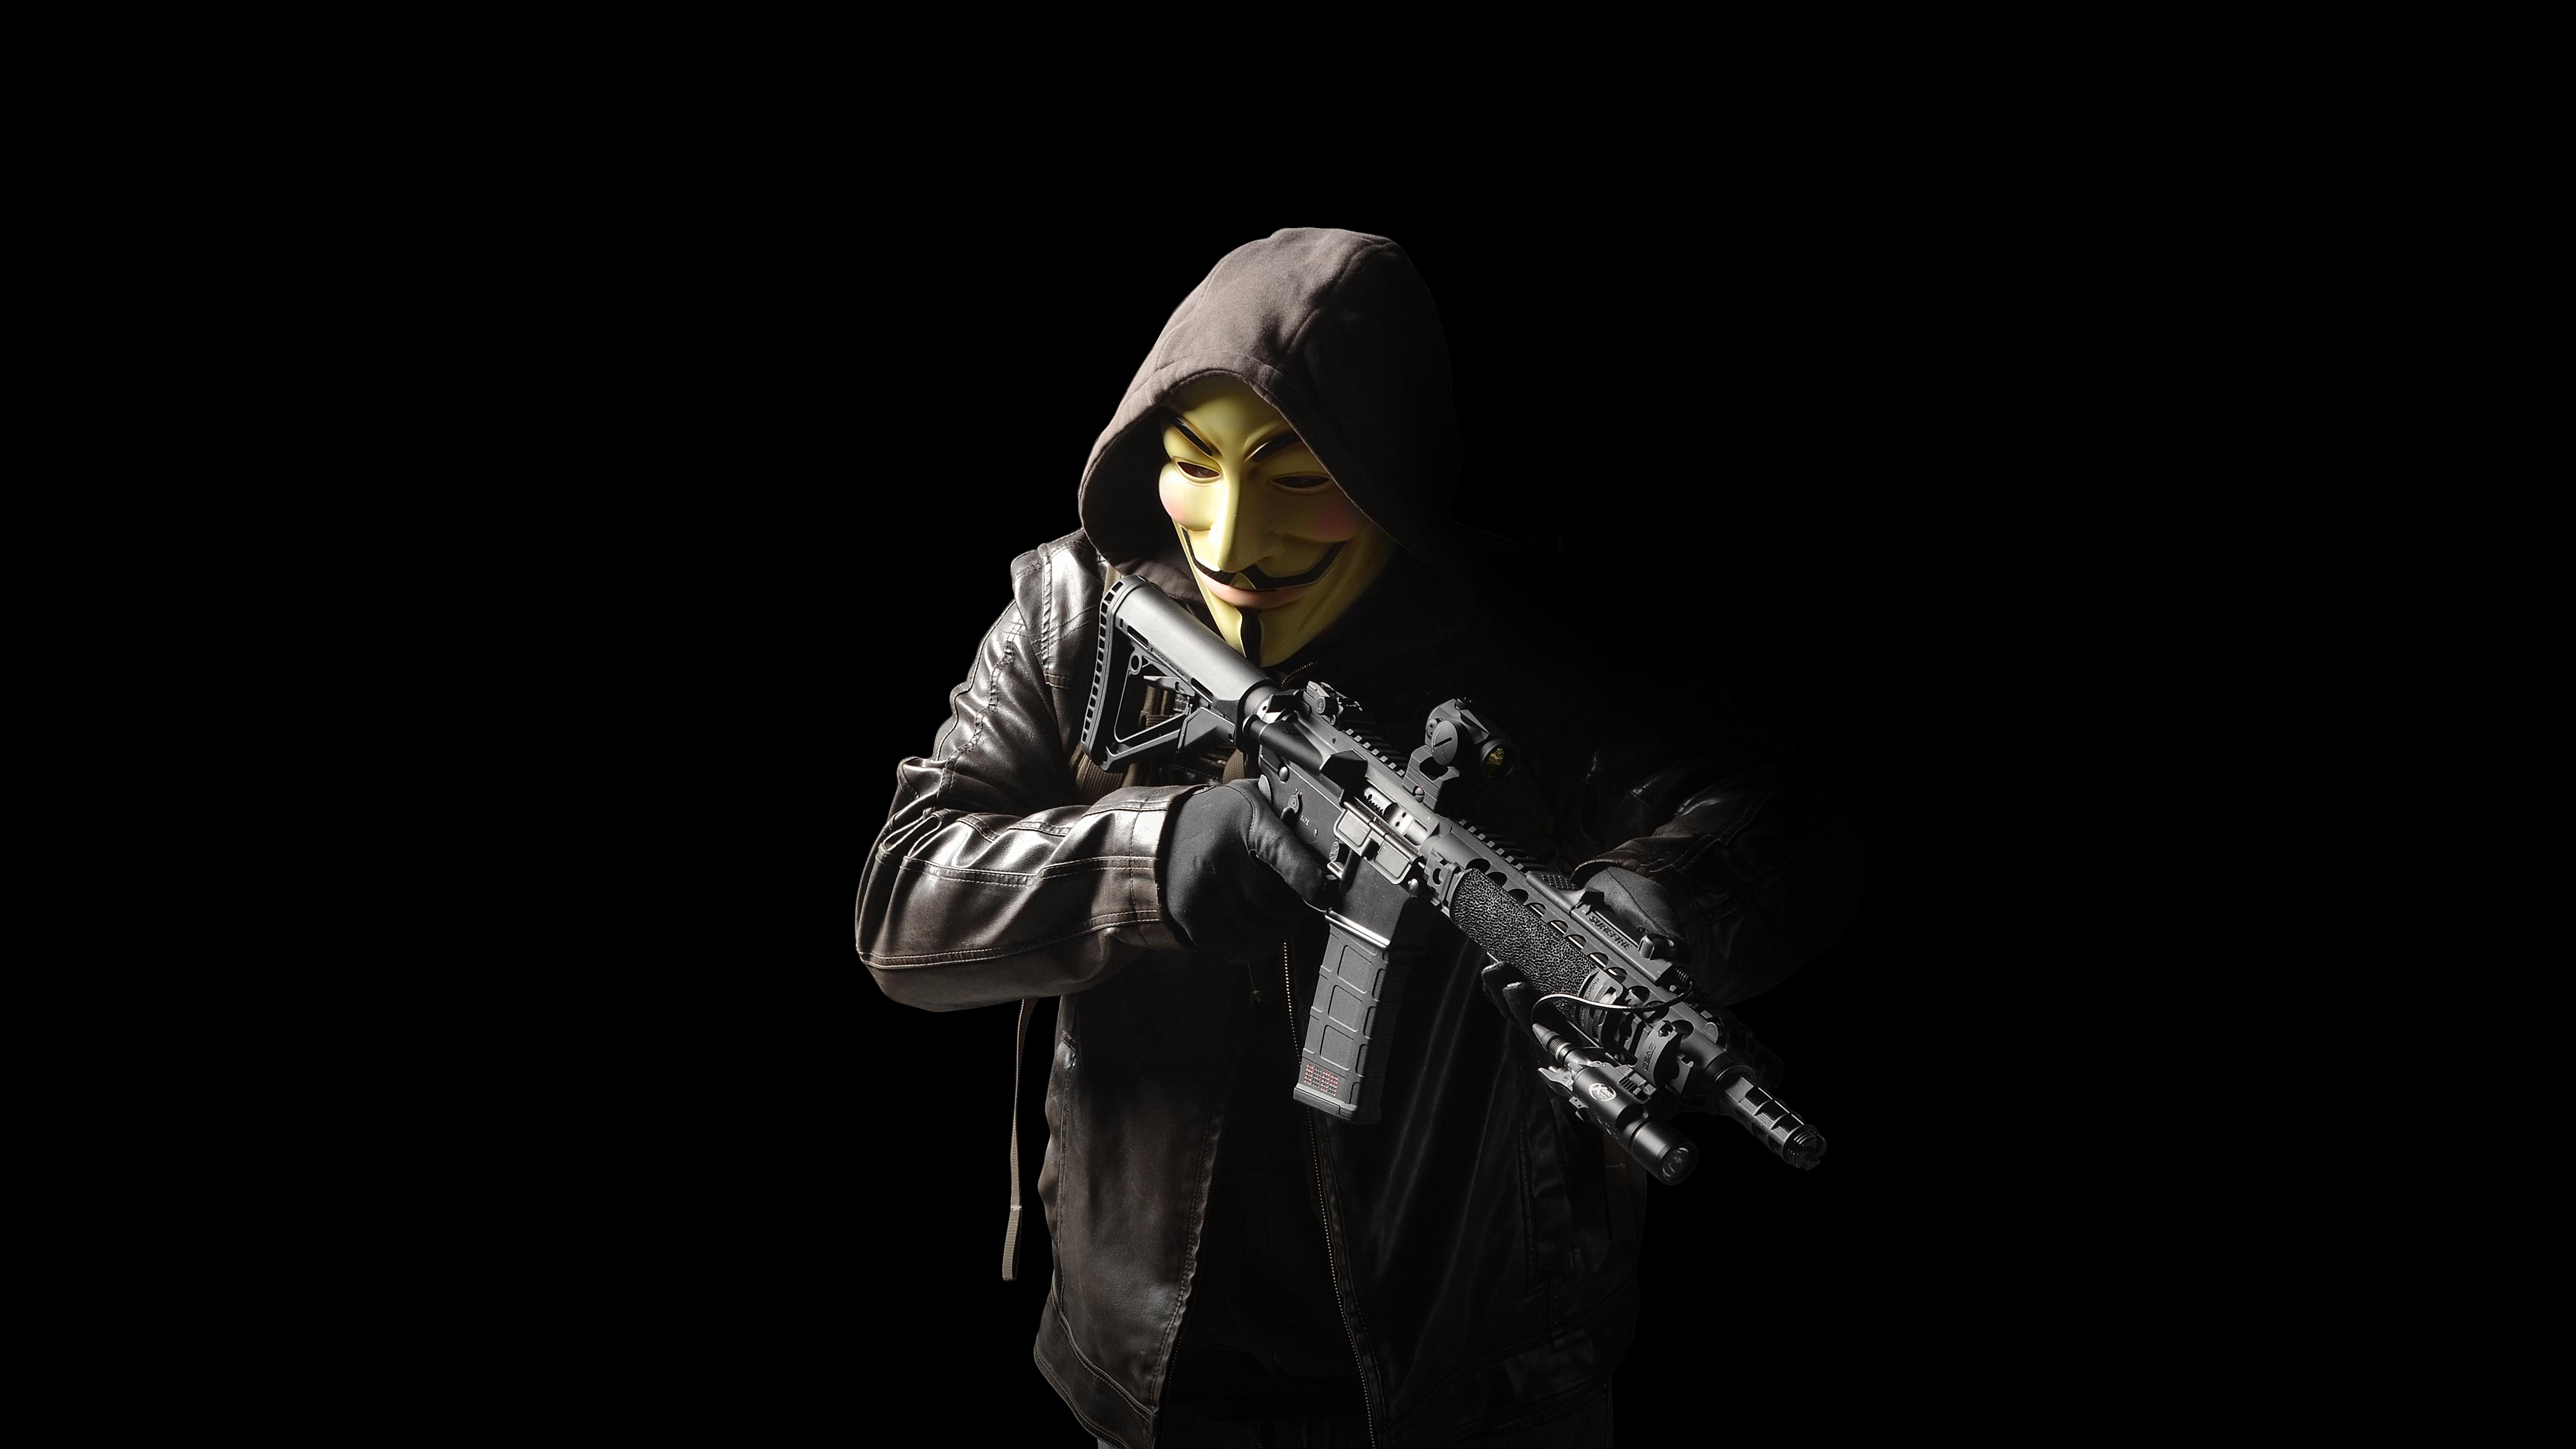 Anonymous 4k Ultra Fondo De Pantalla HD